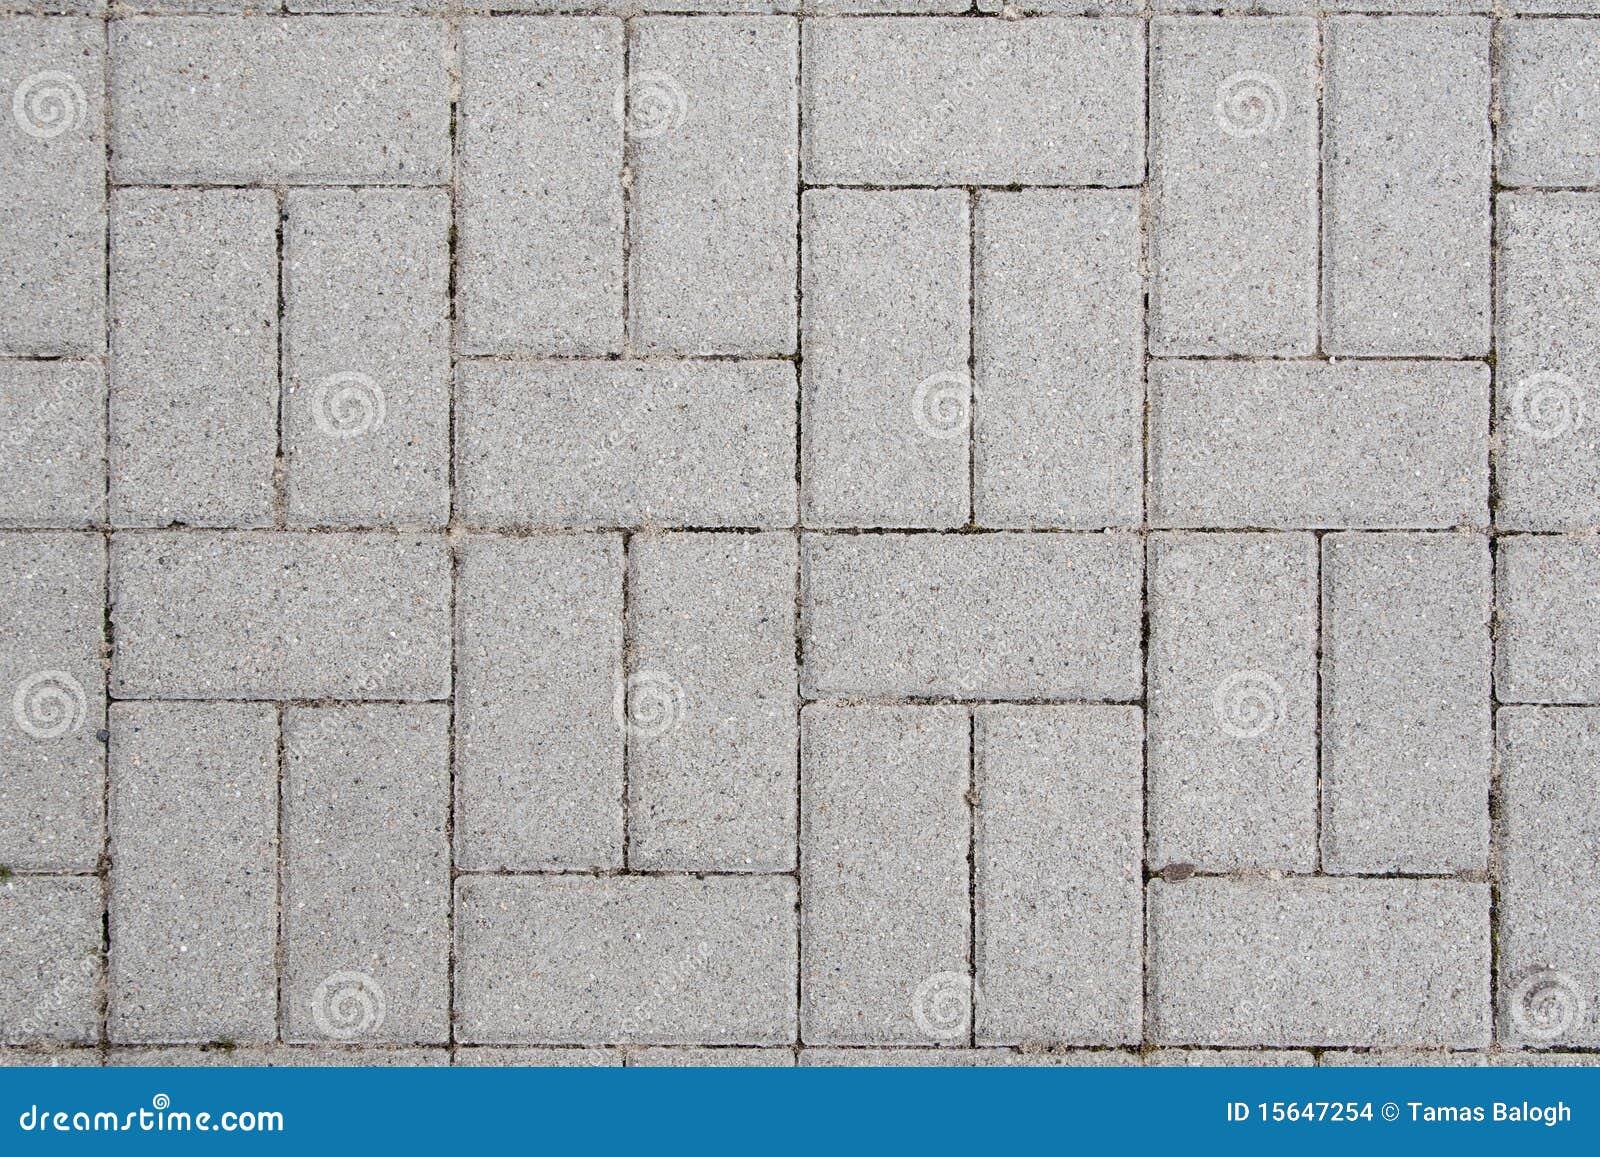 Rock Solid Concrete >> Sidewalk Texture Stock Images - Image: 15647254